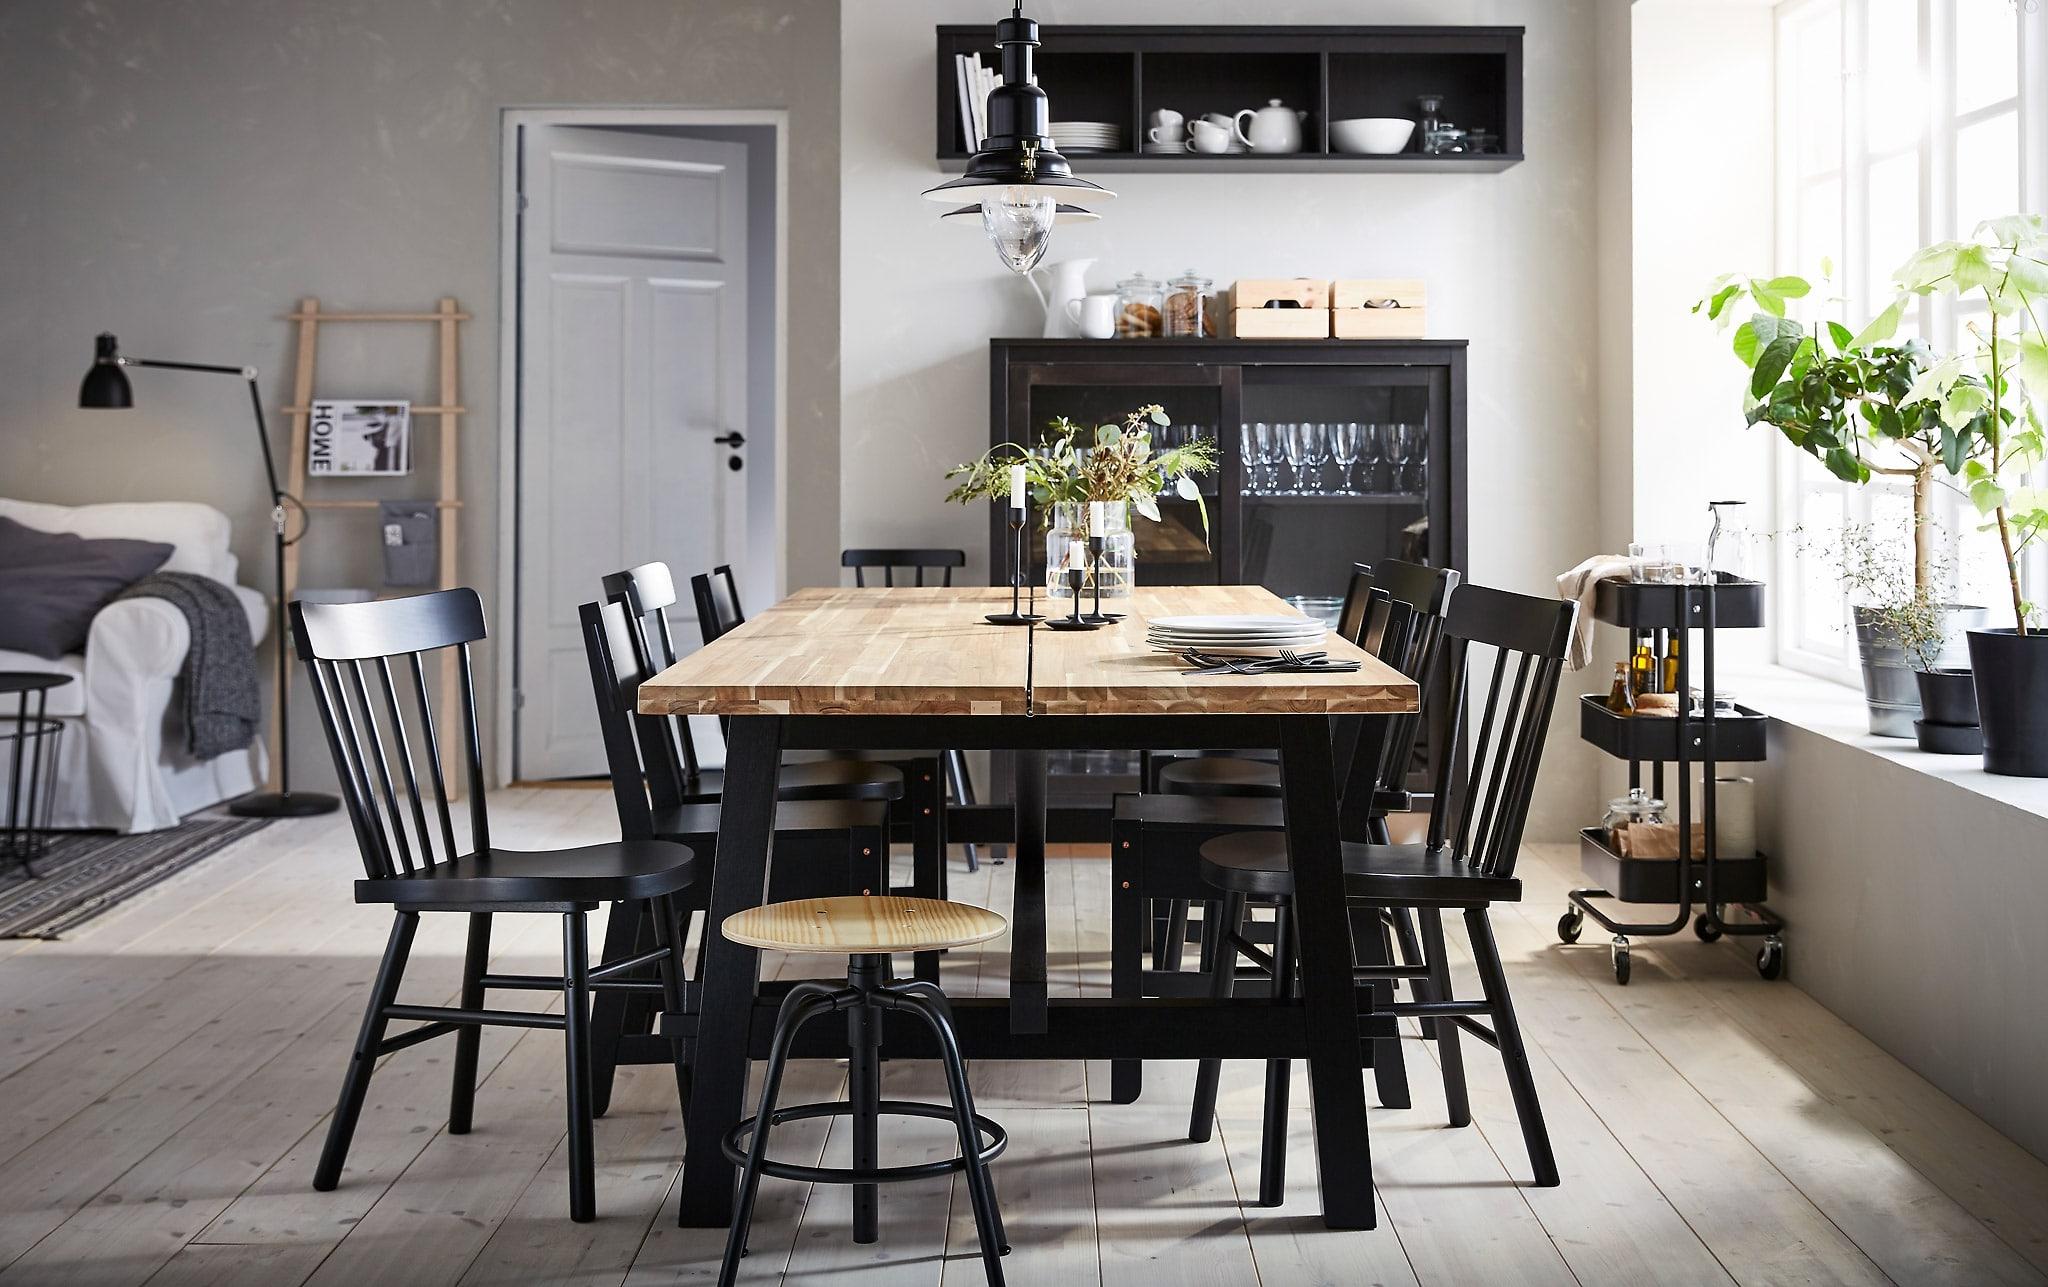 Ikea Muebles Comedor Qwdq Muebles De Edor Pra Online Ikea